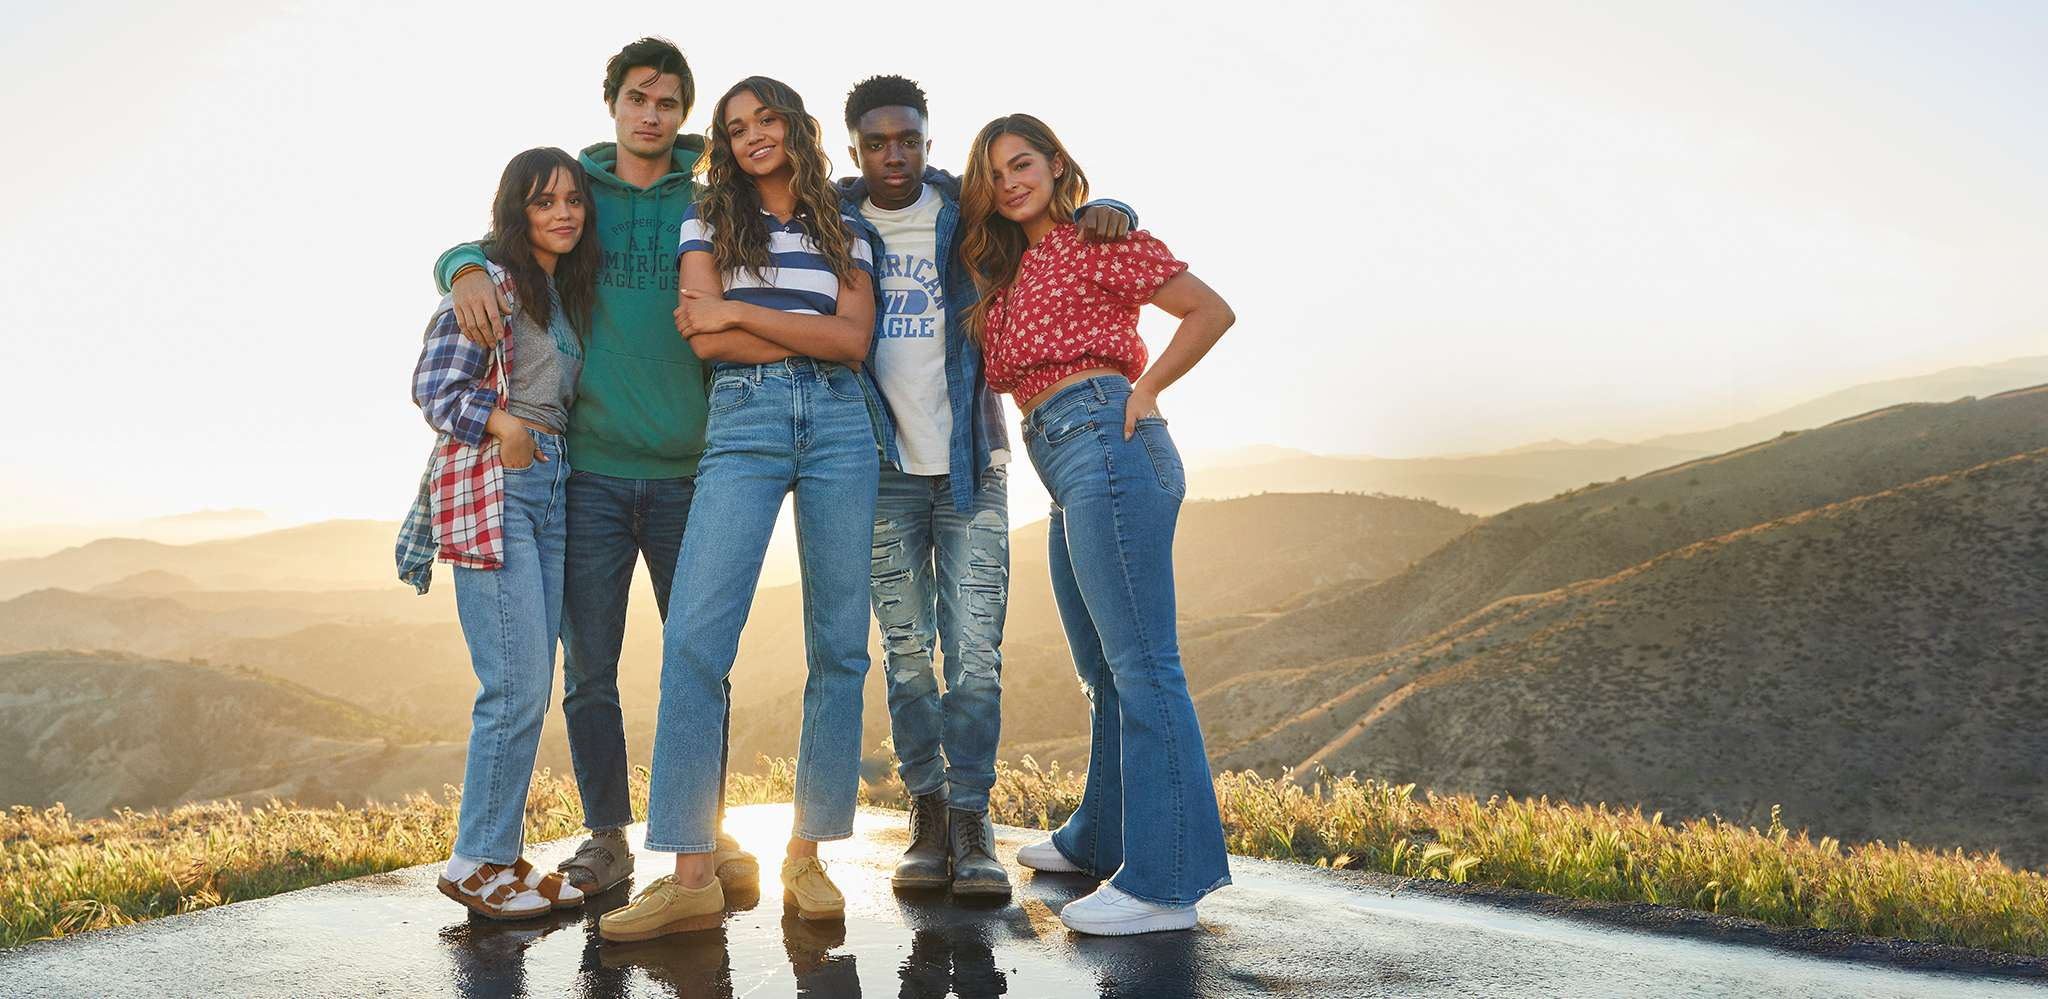 dream jeans